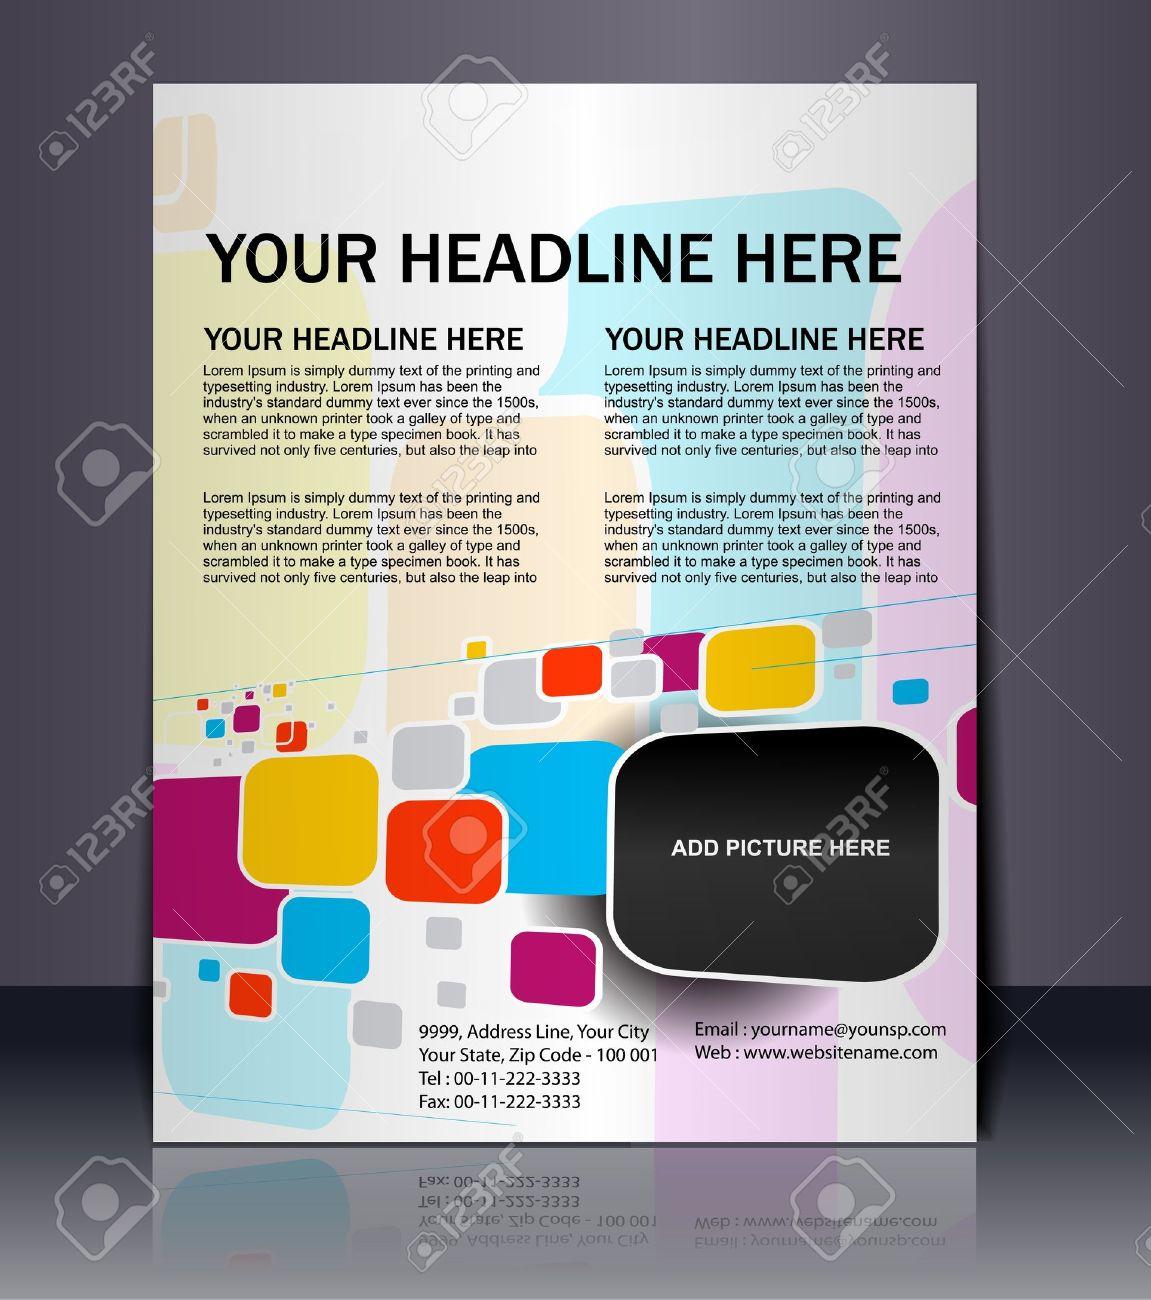 Poster design free - Vector Vector Editable Presentation Of Flyer Poster Design Content Background